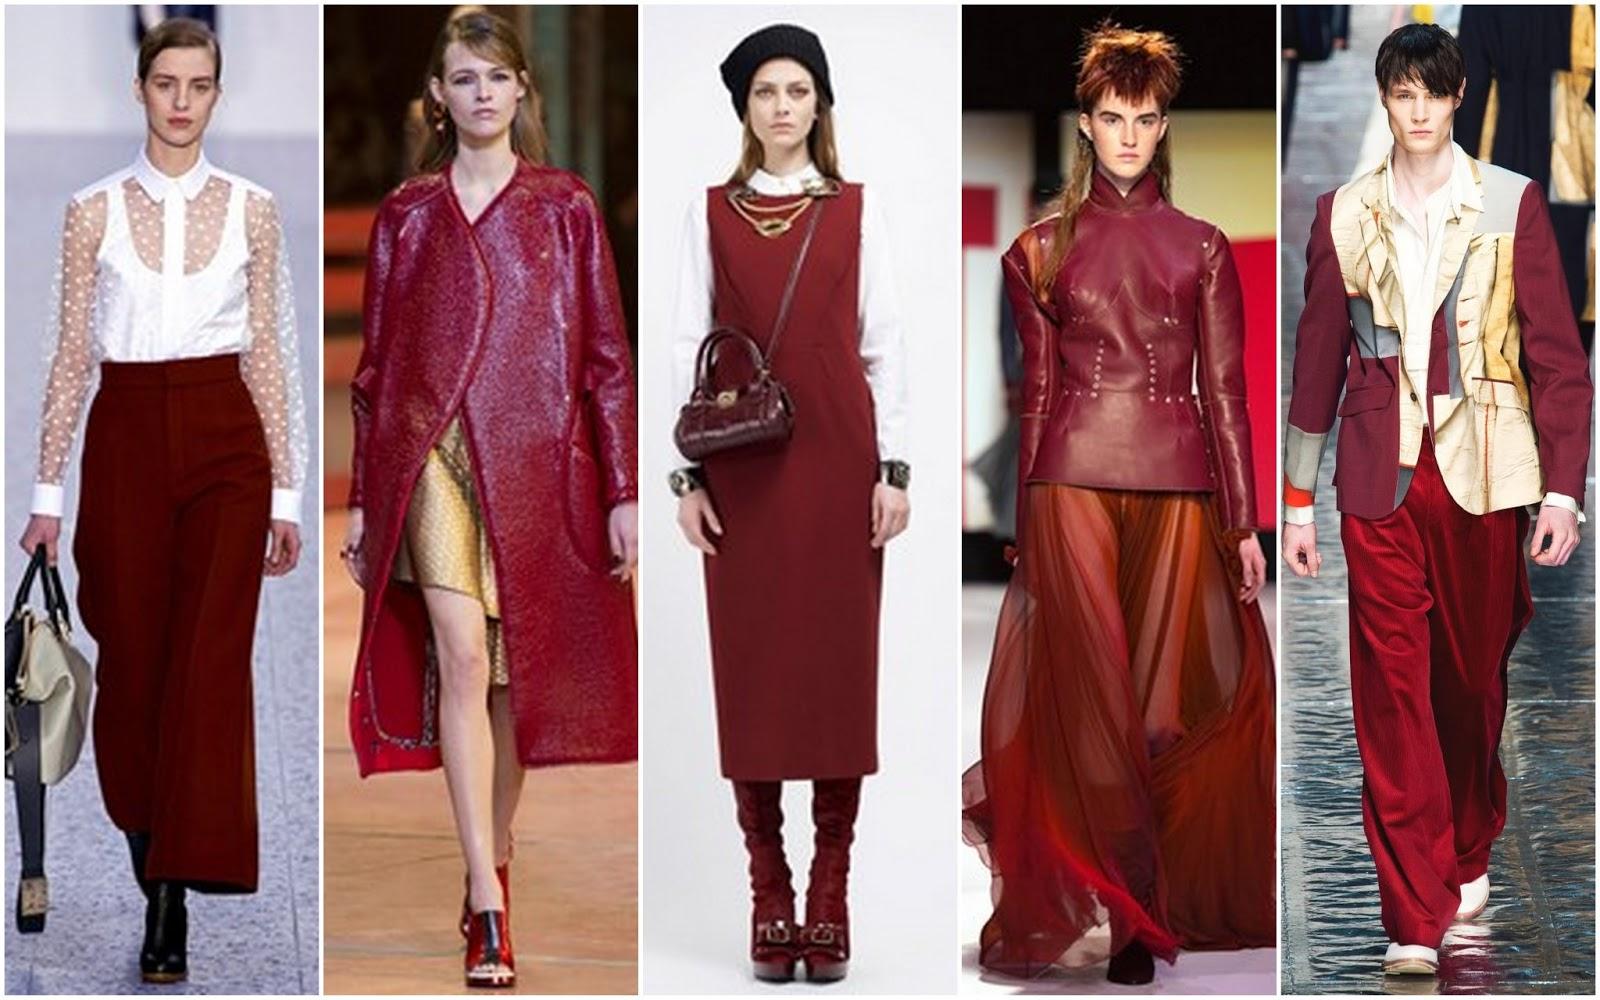 Pin by Beautifully Fierce on Milan Fashion Week Fall 2013